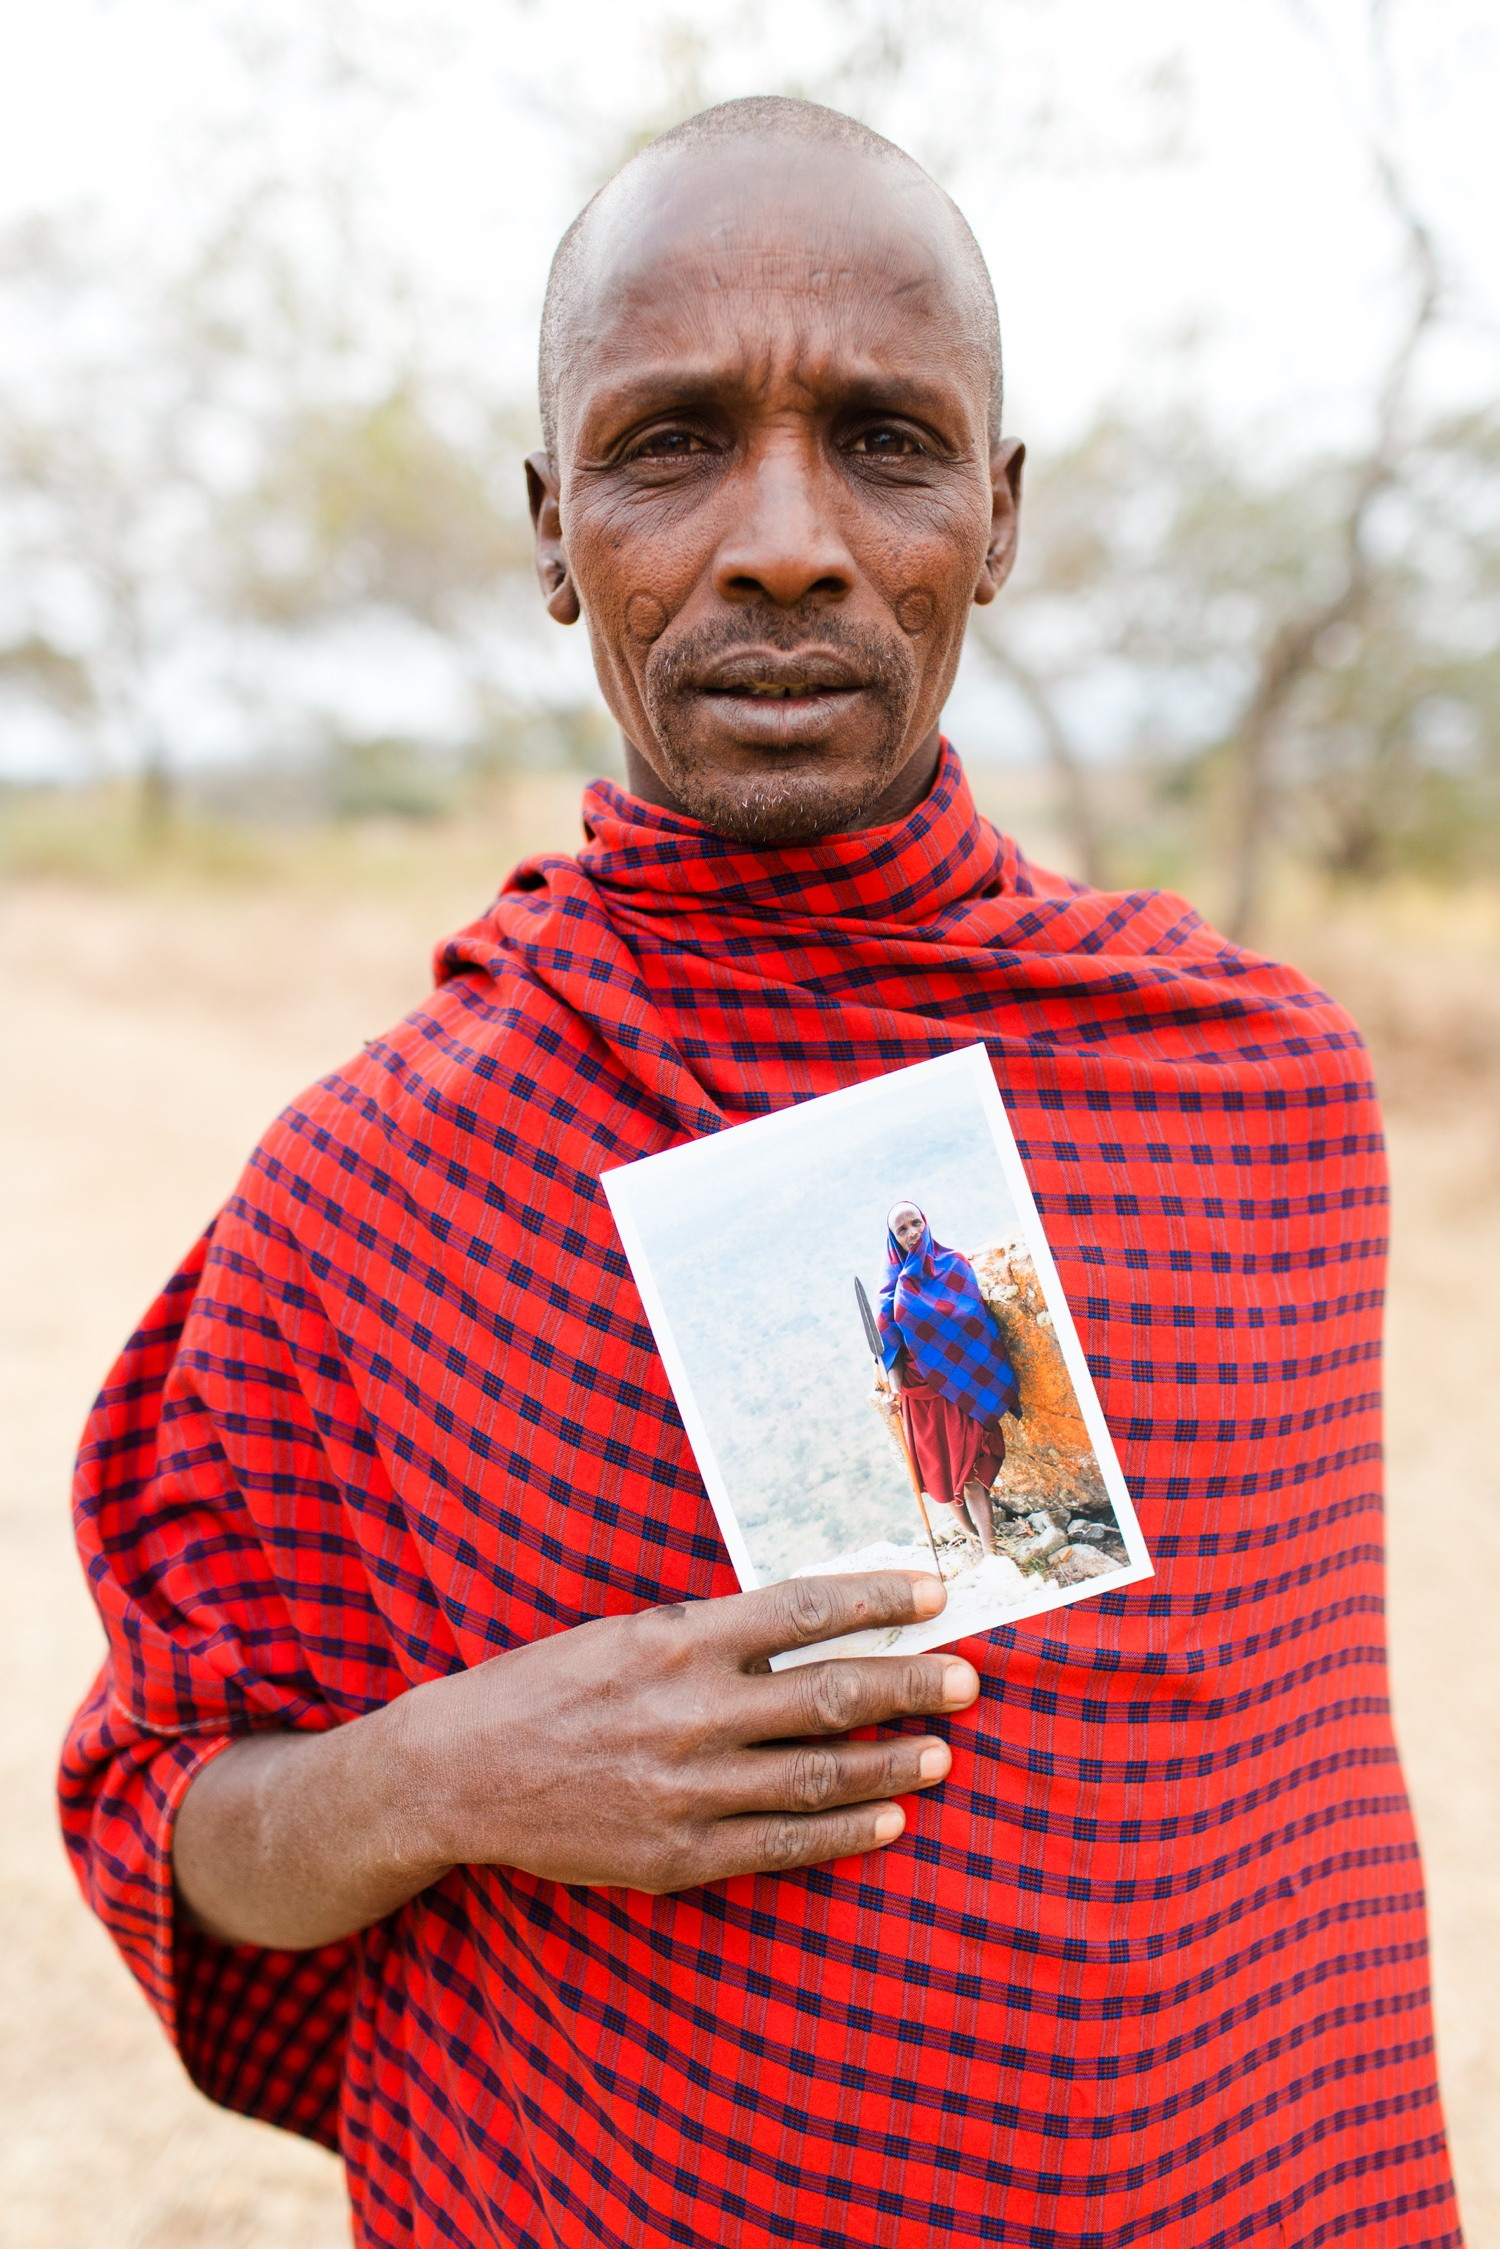 cameron-zegers-destination-wedding-photographer-tanzania.jpg